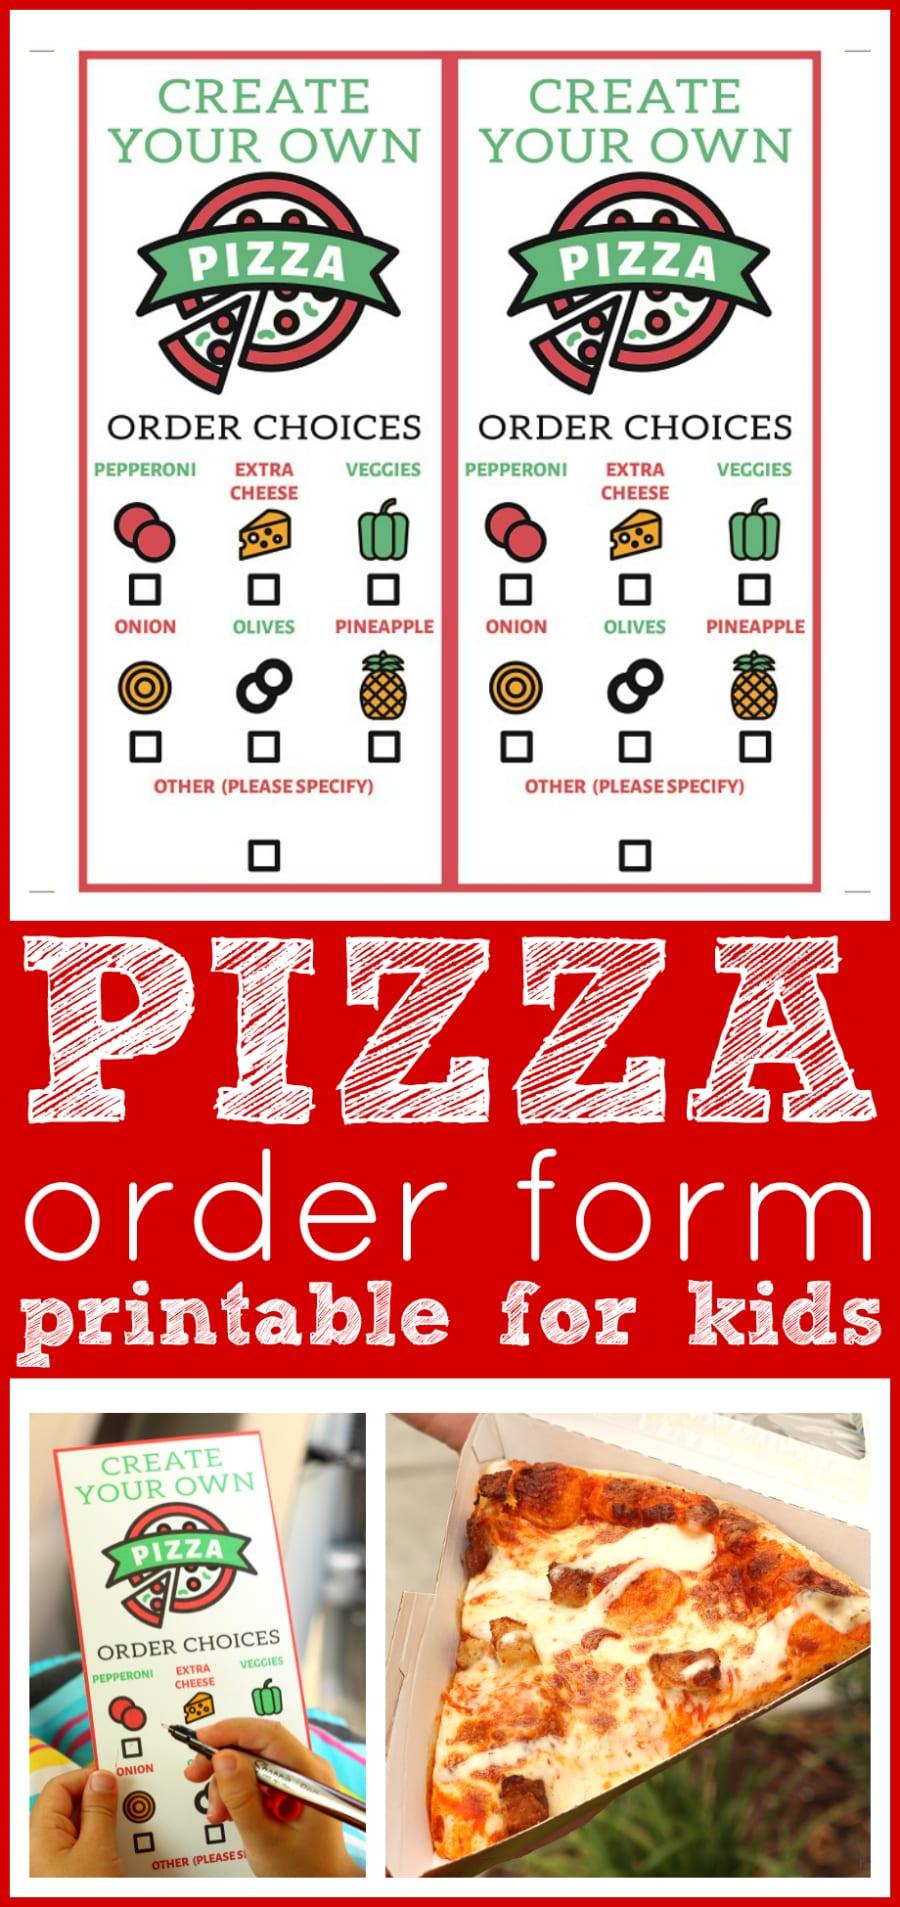 Pizza order form for kids